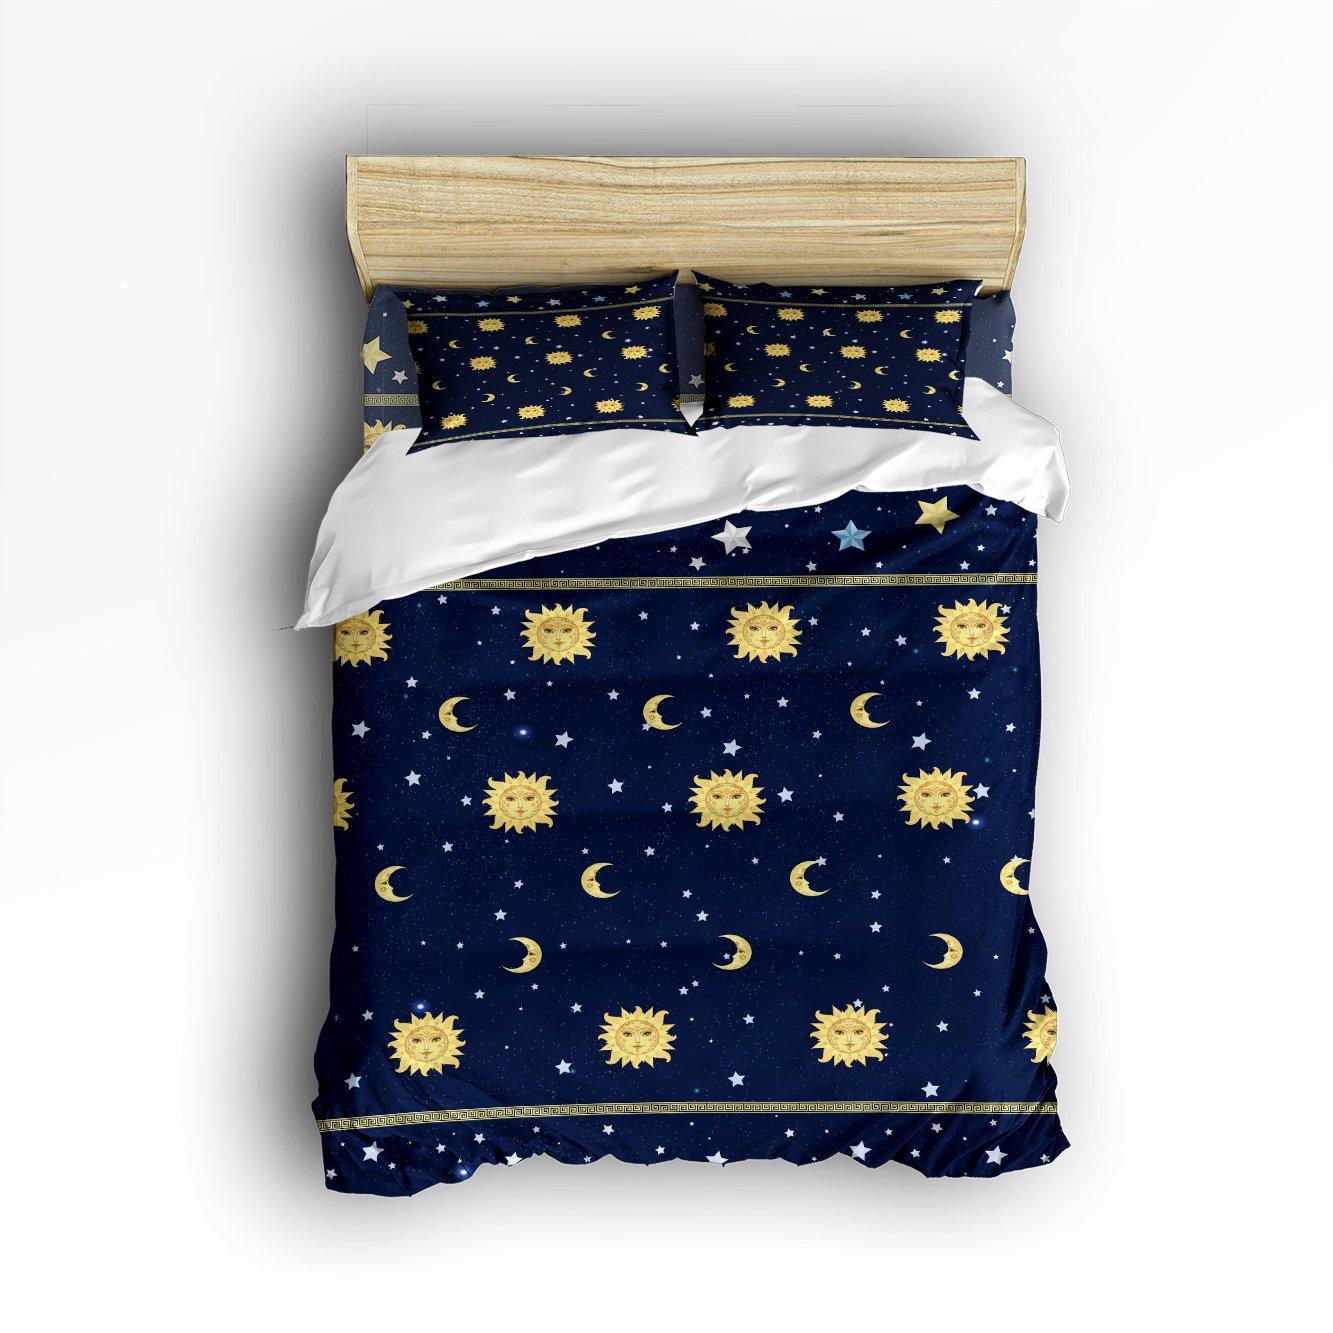 Libaoge 4 Piece Bed Sheets Set, Sunshine Hippie Mandala Pattern Sun Moon Stars Print, 1 Flat Sheet 1 Duvet Cover and 2 Pillow Cases